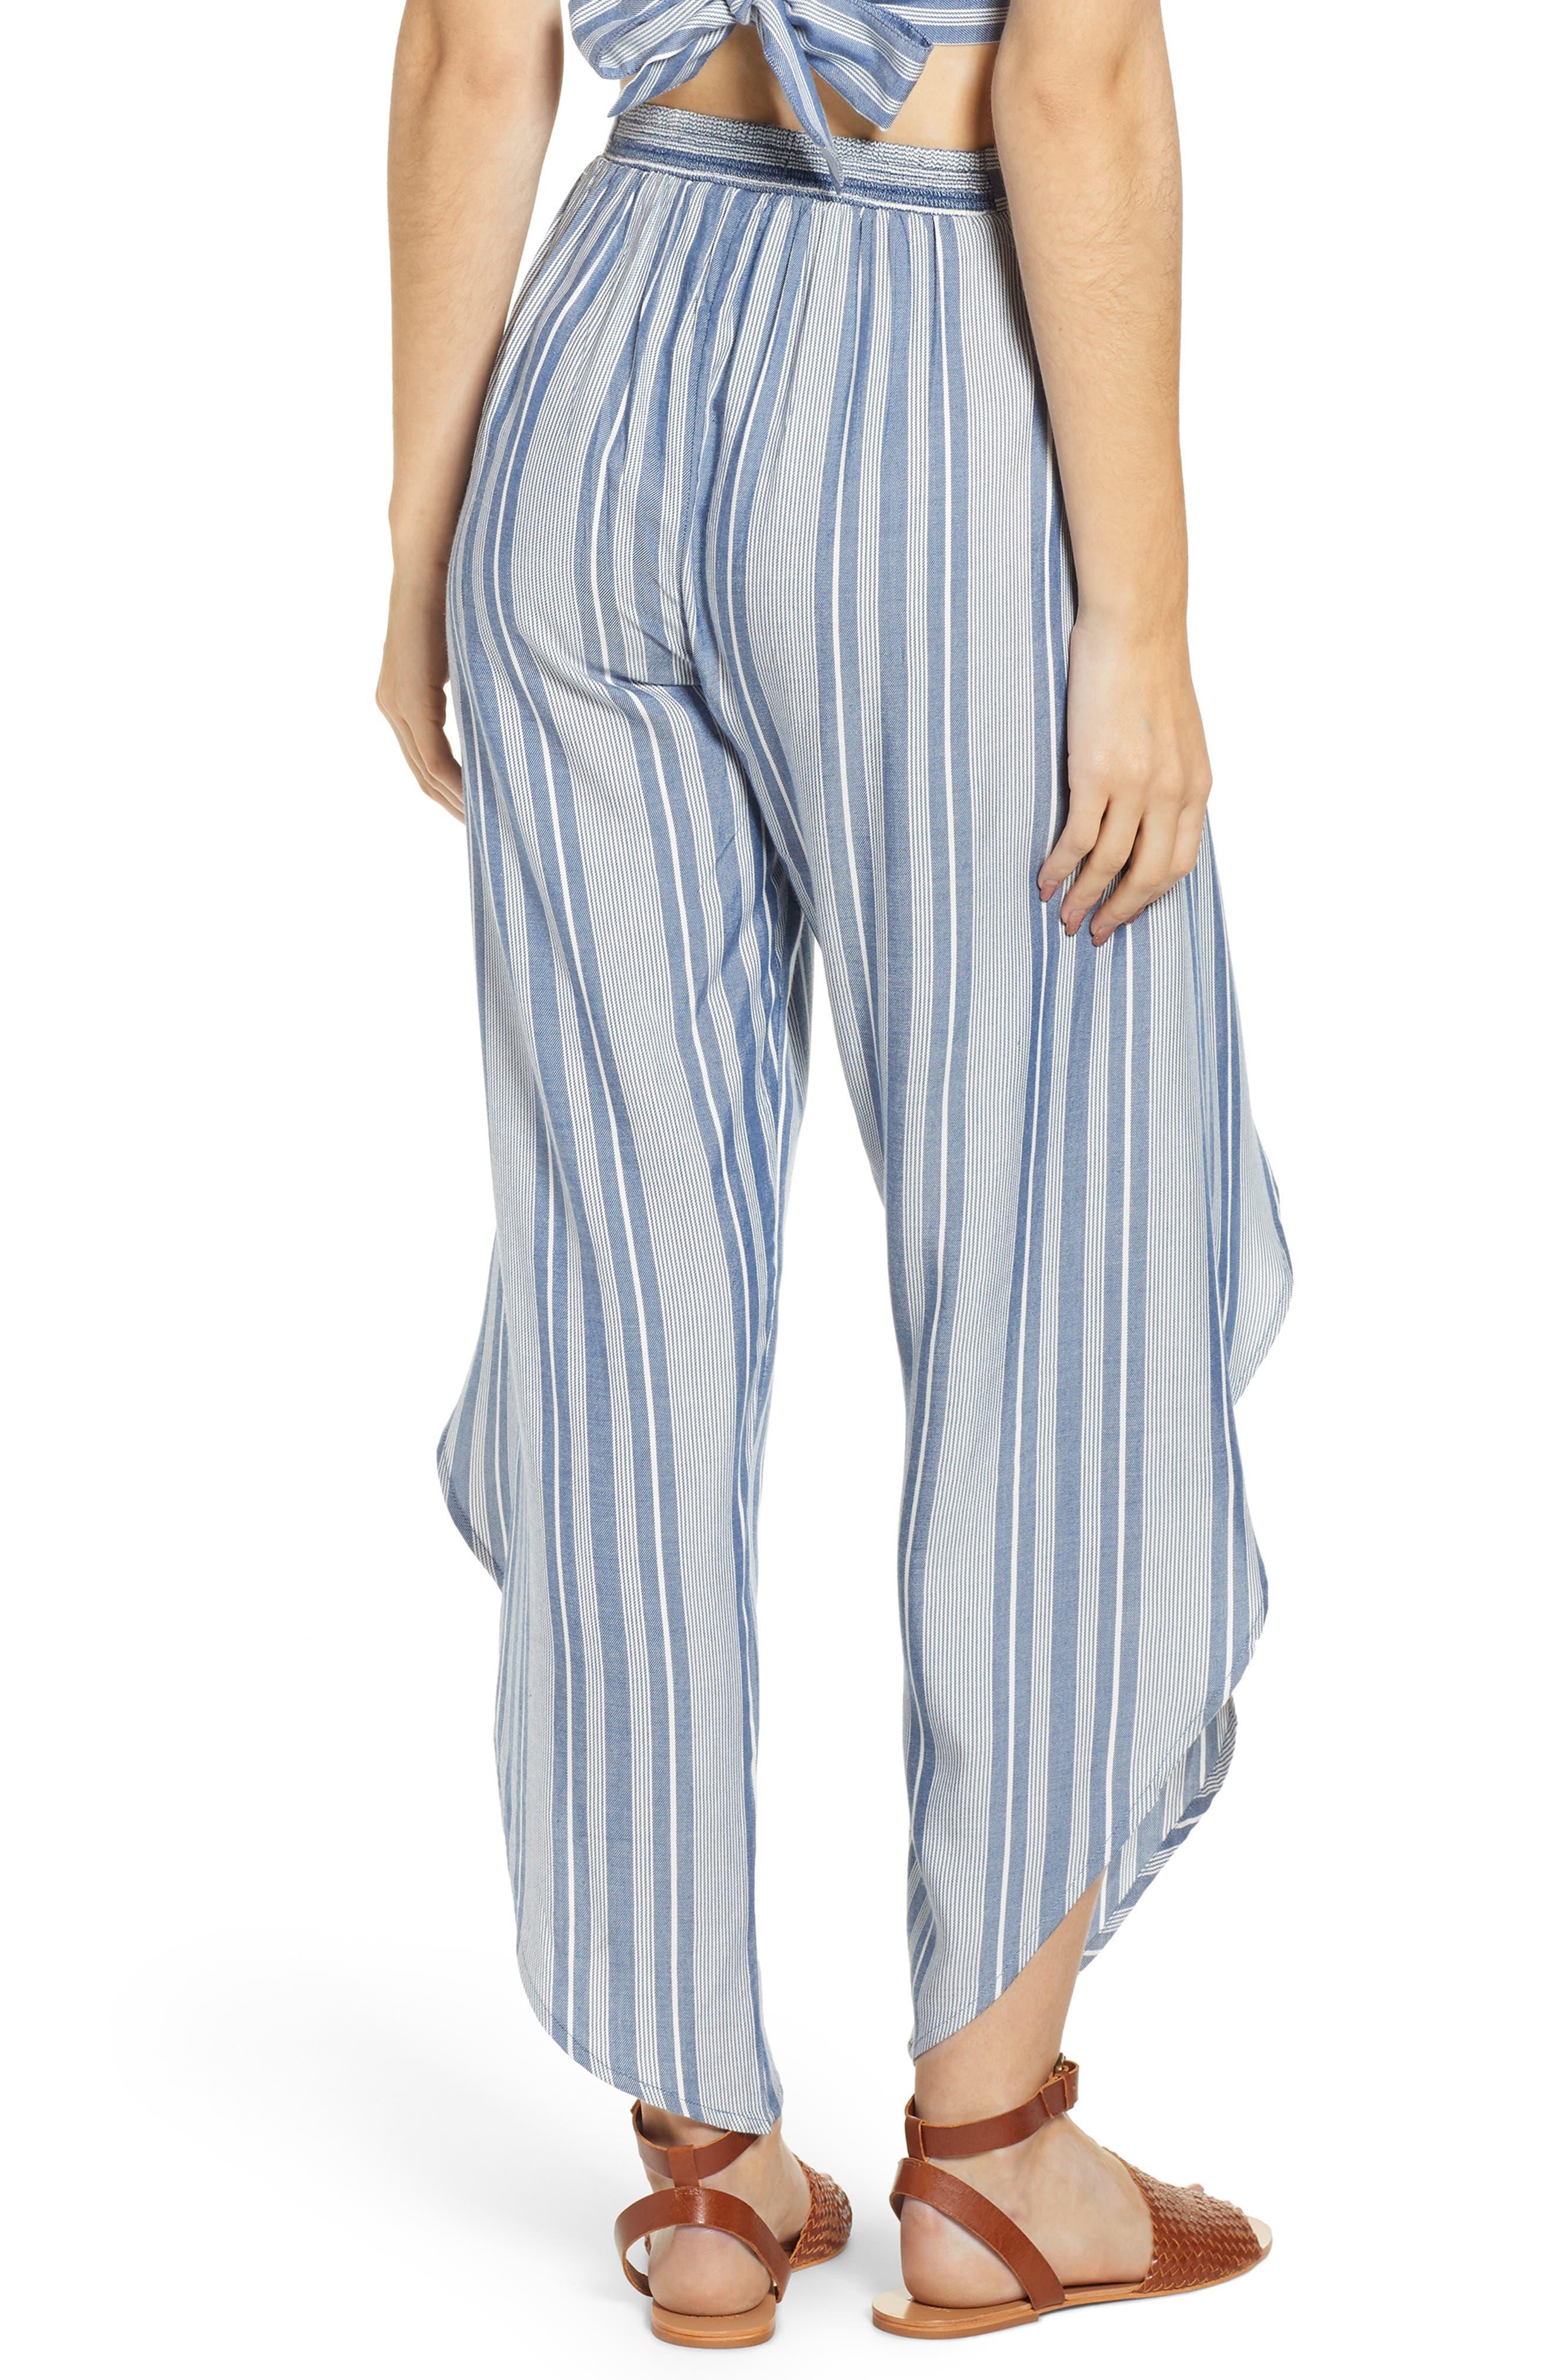 Jessa Stripe Tulip Hem Pants,                             Alternate thumbnail 2, color,                             MARSHMALLOW EMBROIDERED FLORAL